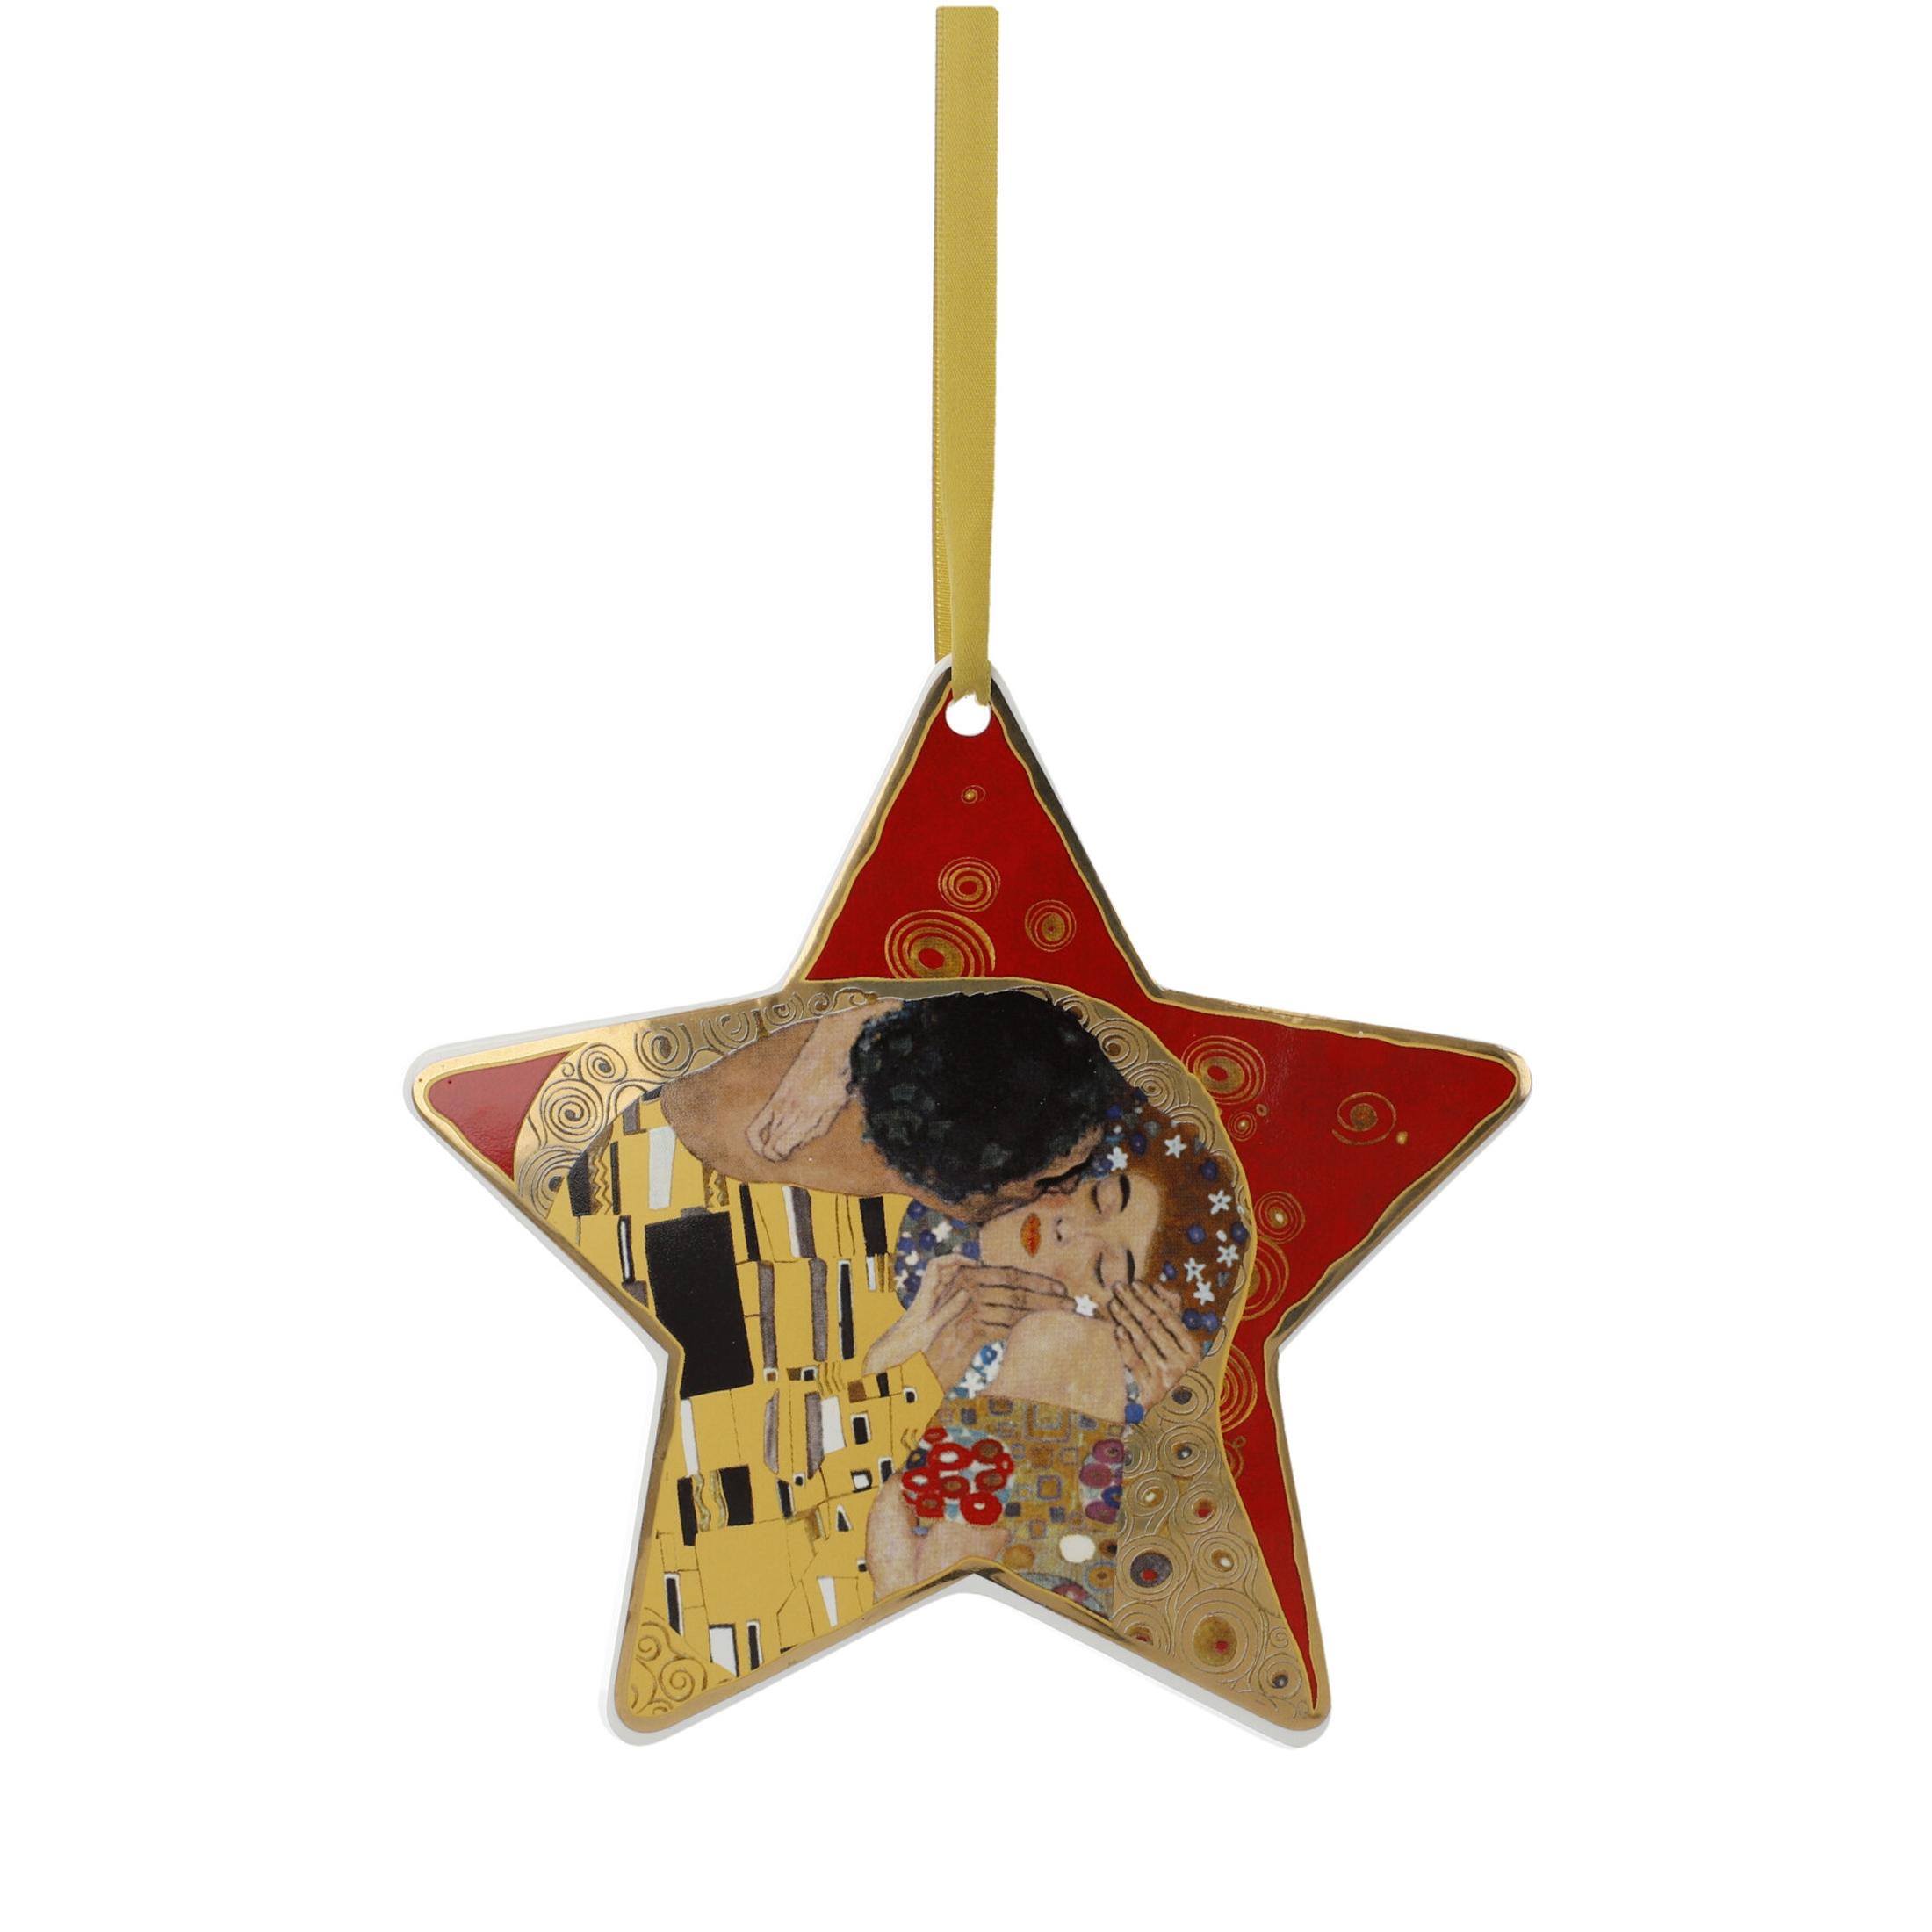 Goebel Artis Orbis Gustav Klimt Christmas Time 'Der Kuss Rot - Hängeornament' 2021 !